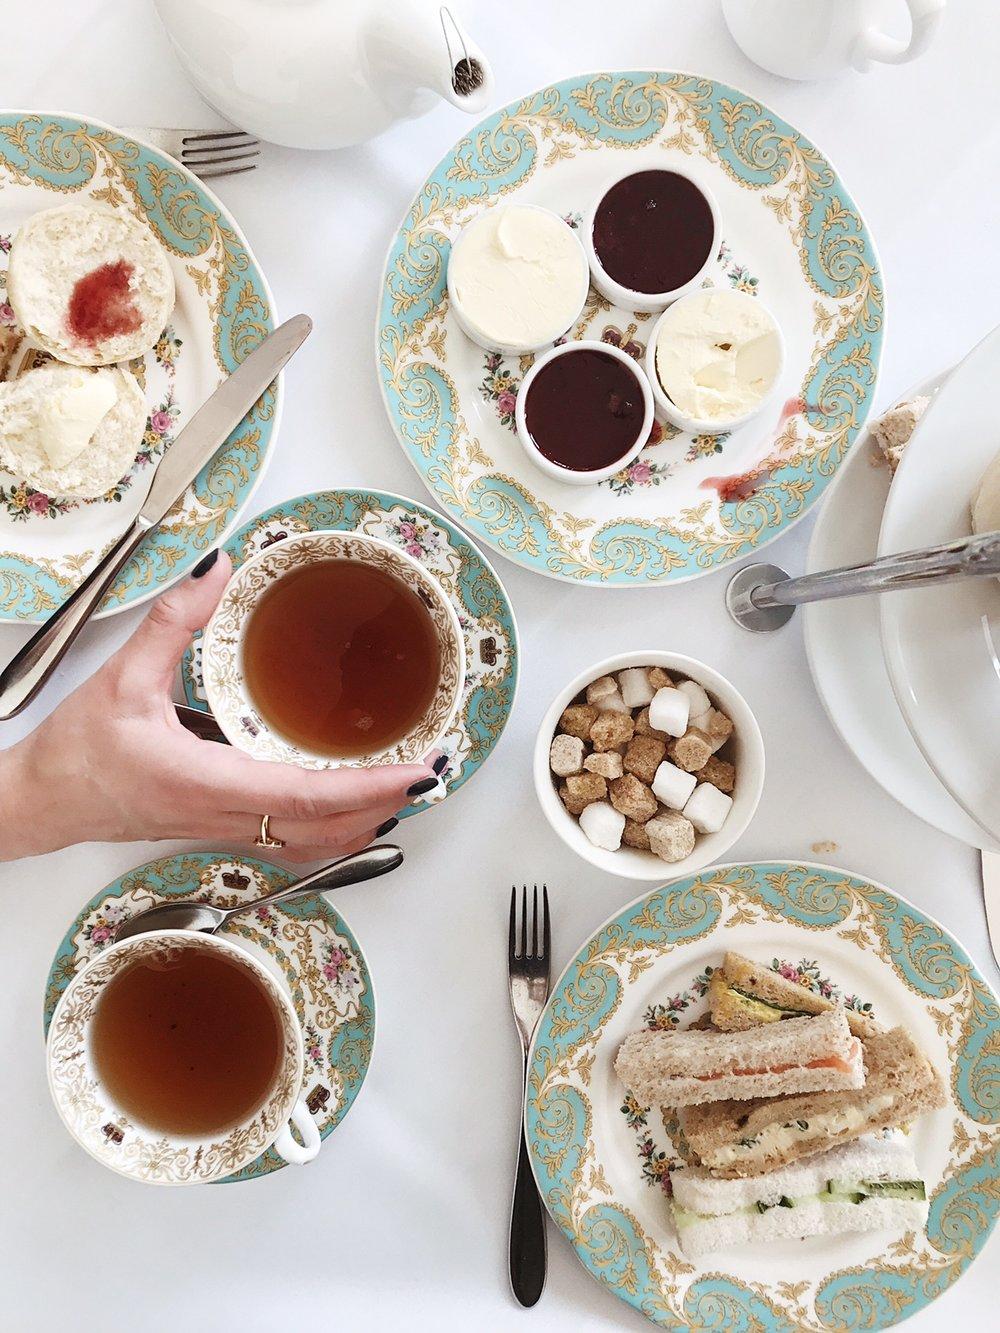 Orangery-London-Afternoon-Tea-MonicaFrancis